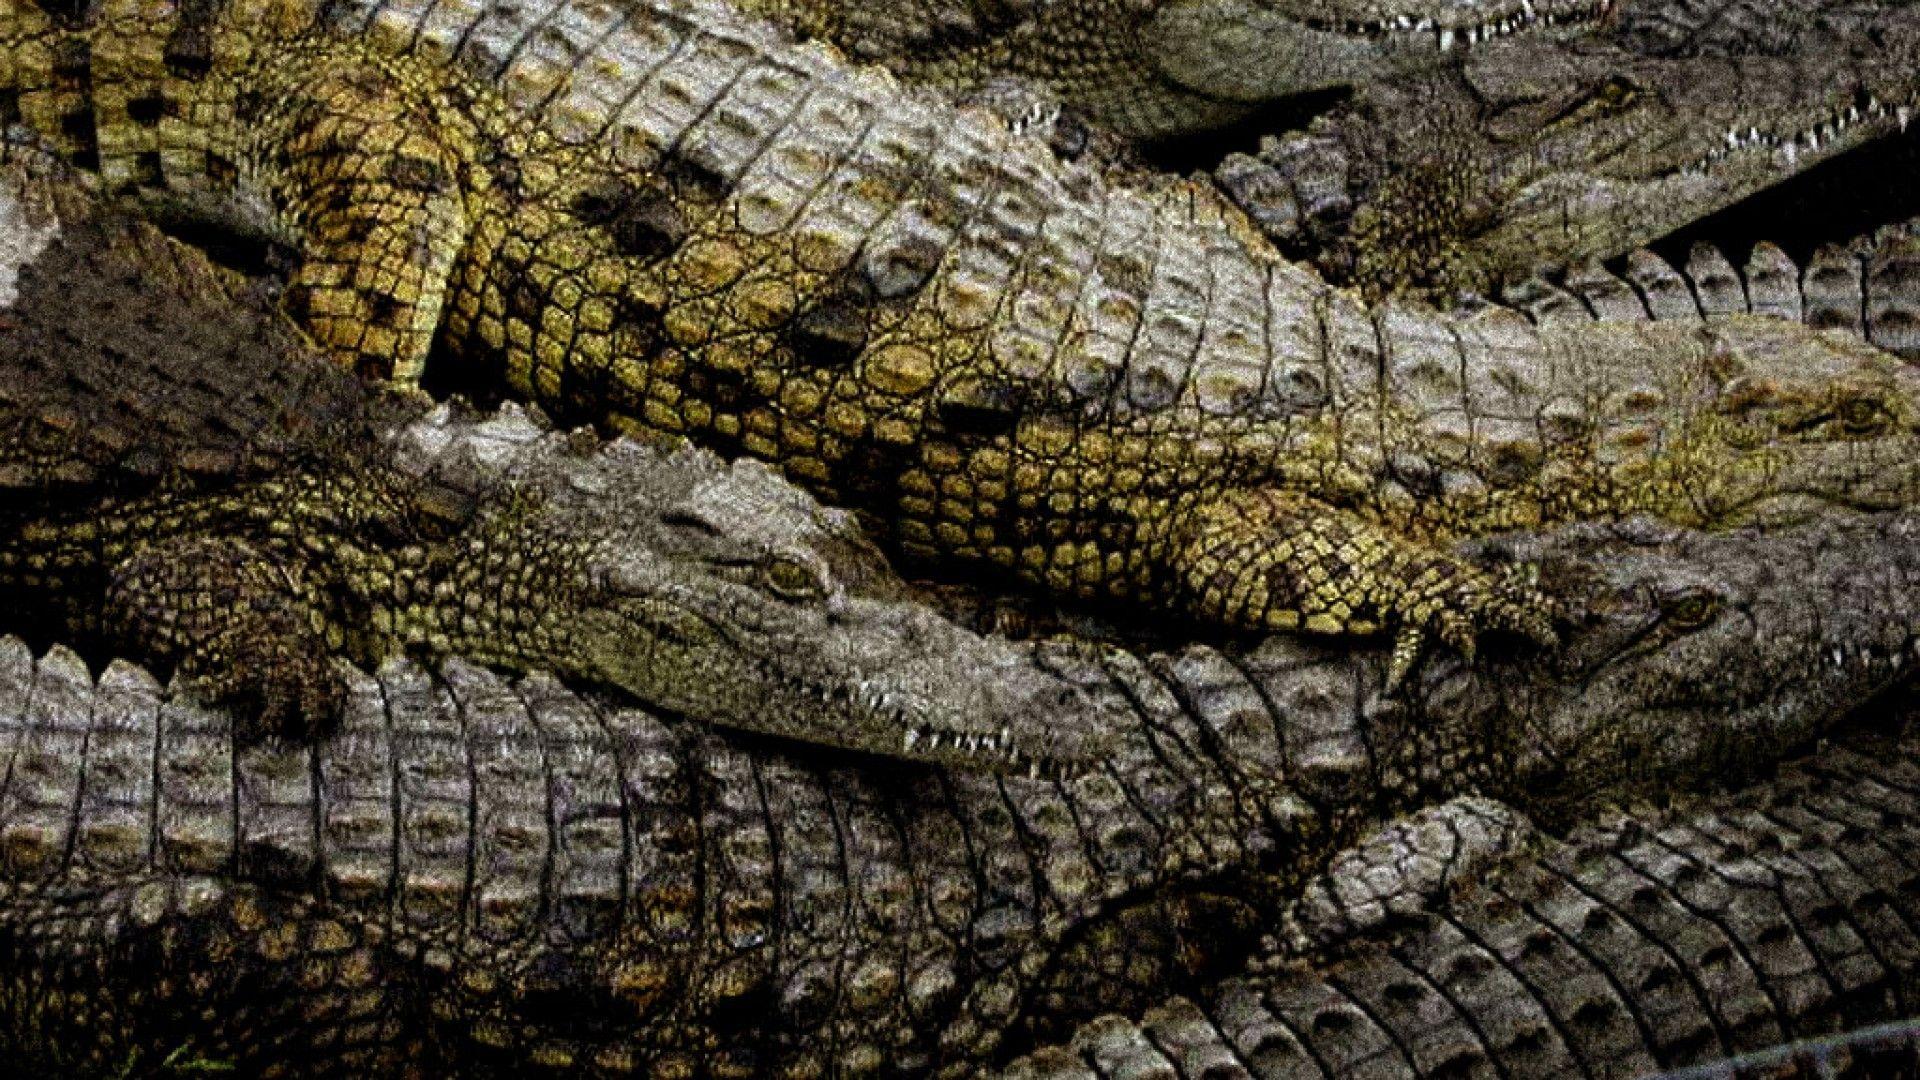 Exotic Animals Crocodile